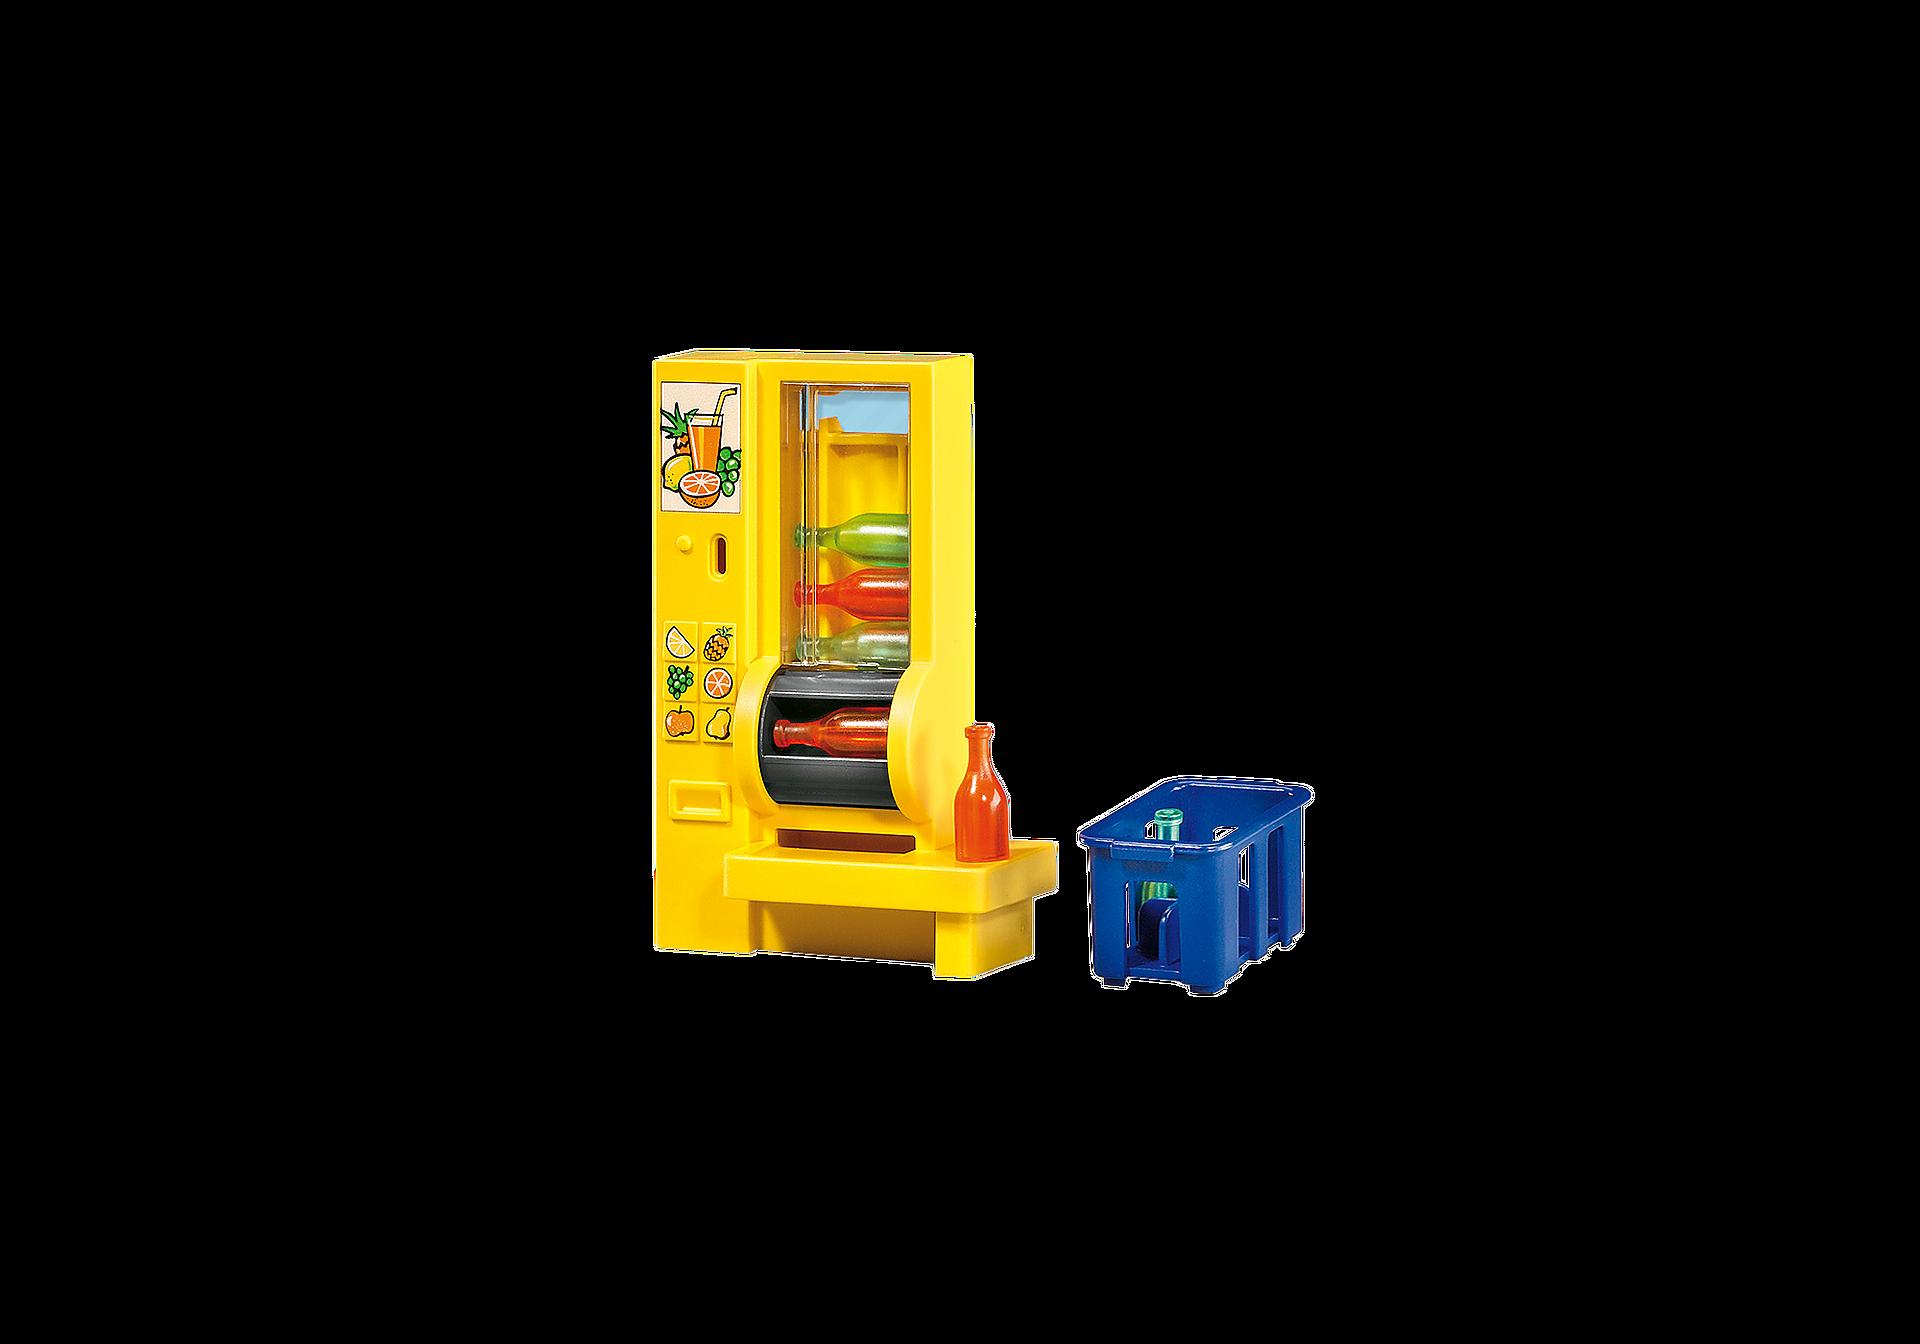 7931 Máquina Expendedora zoom image1